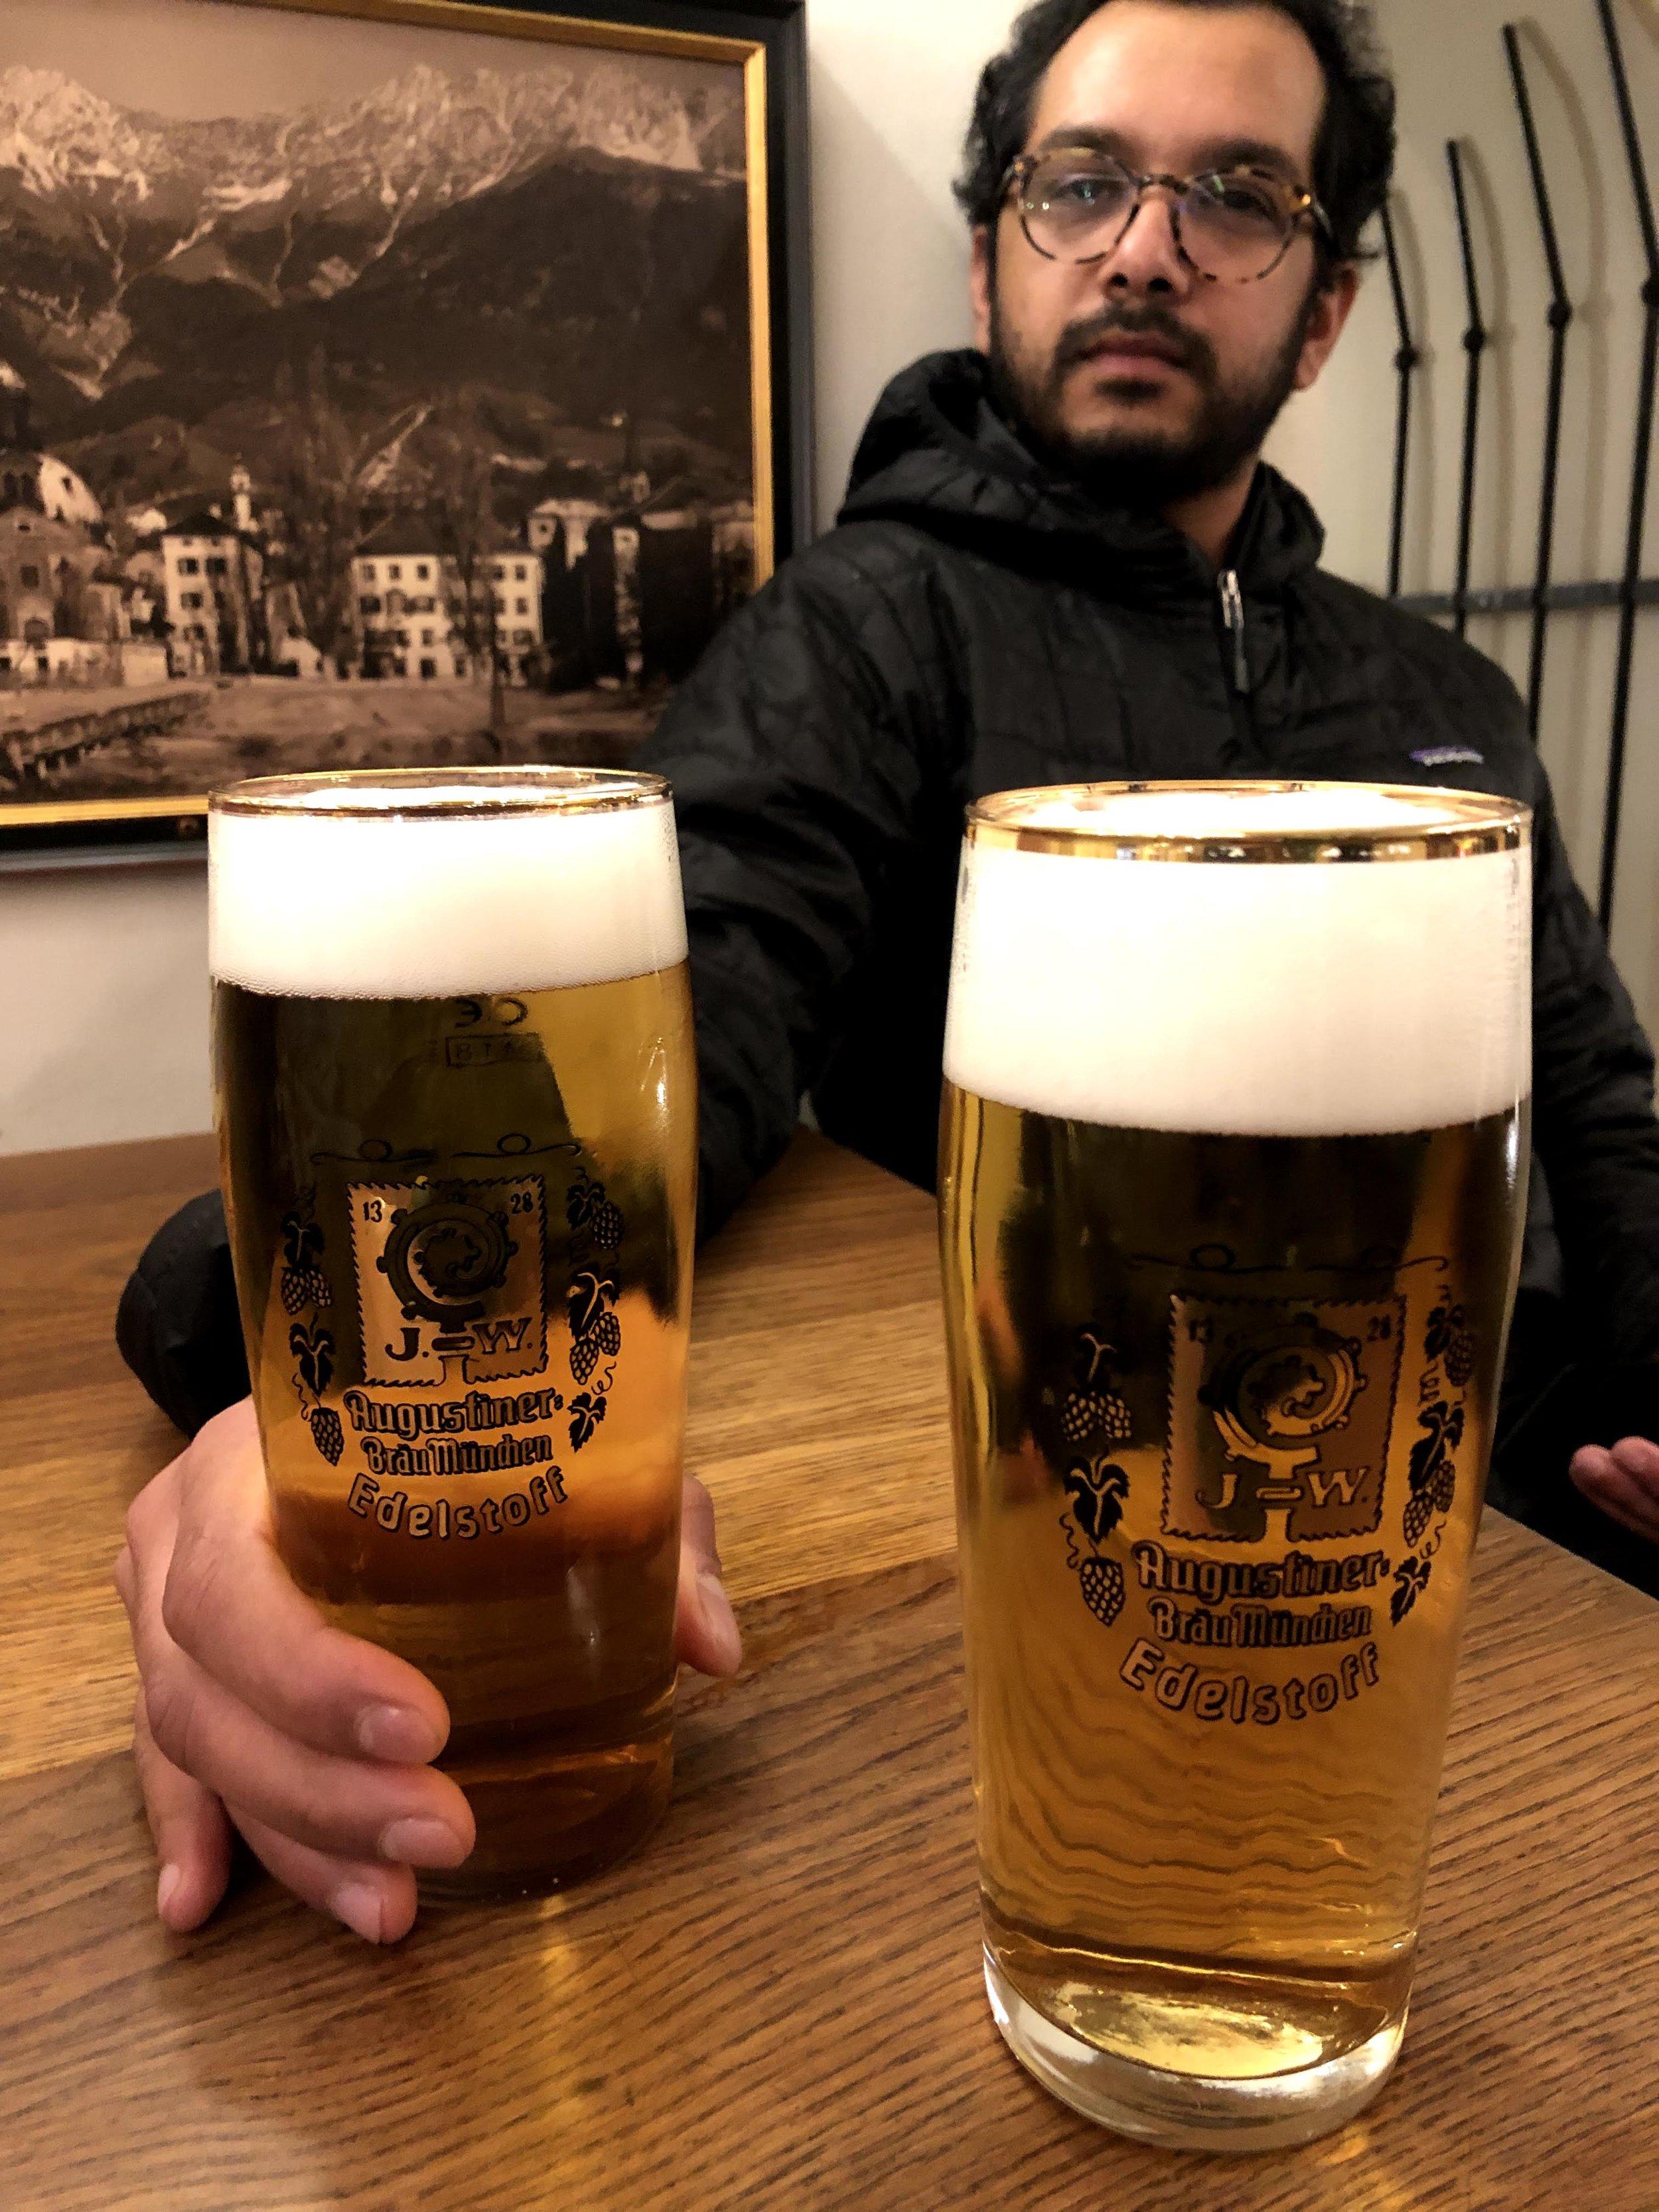 Augustiner beers at Stifskeller in Innsbruck Austria